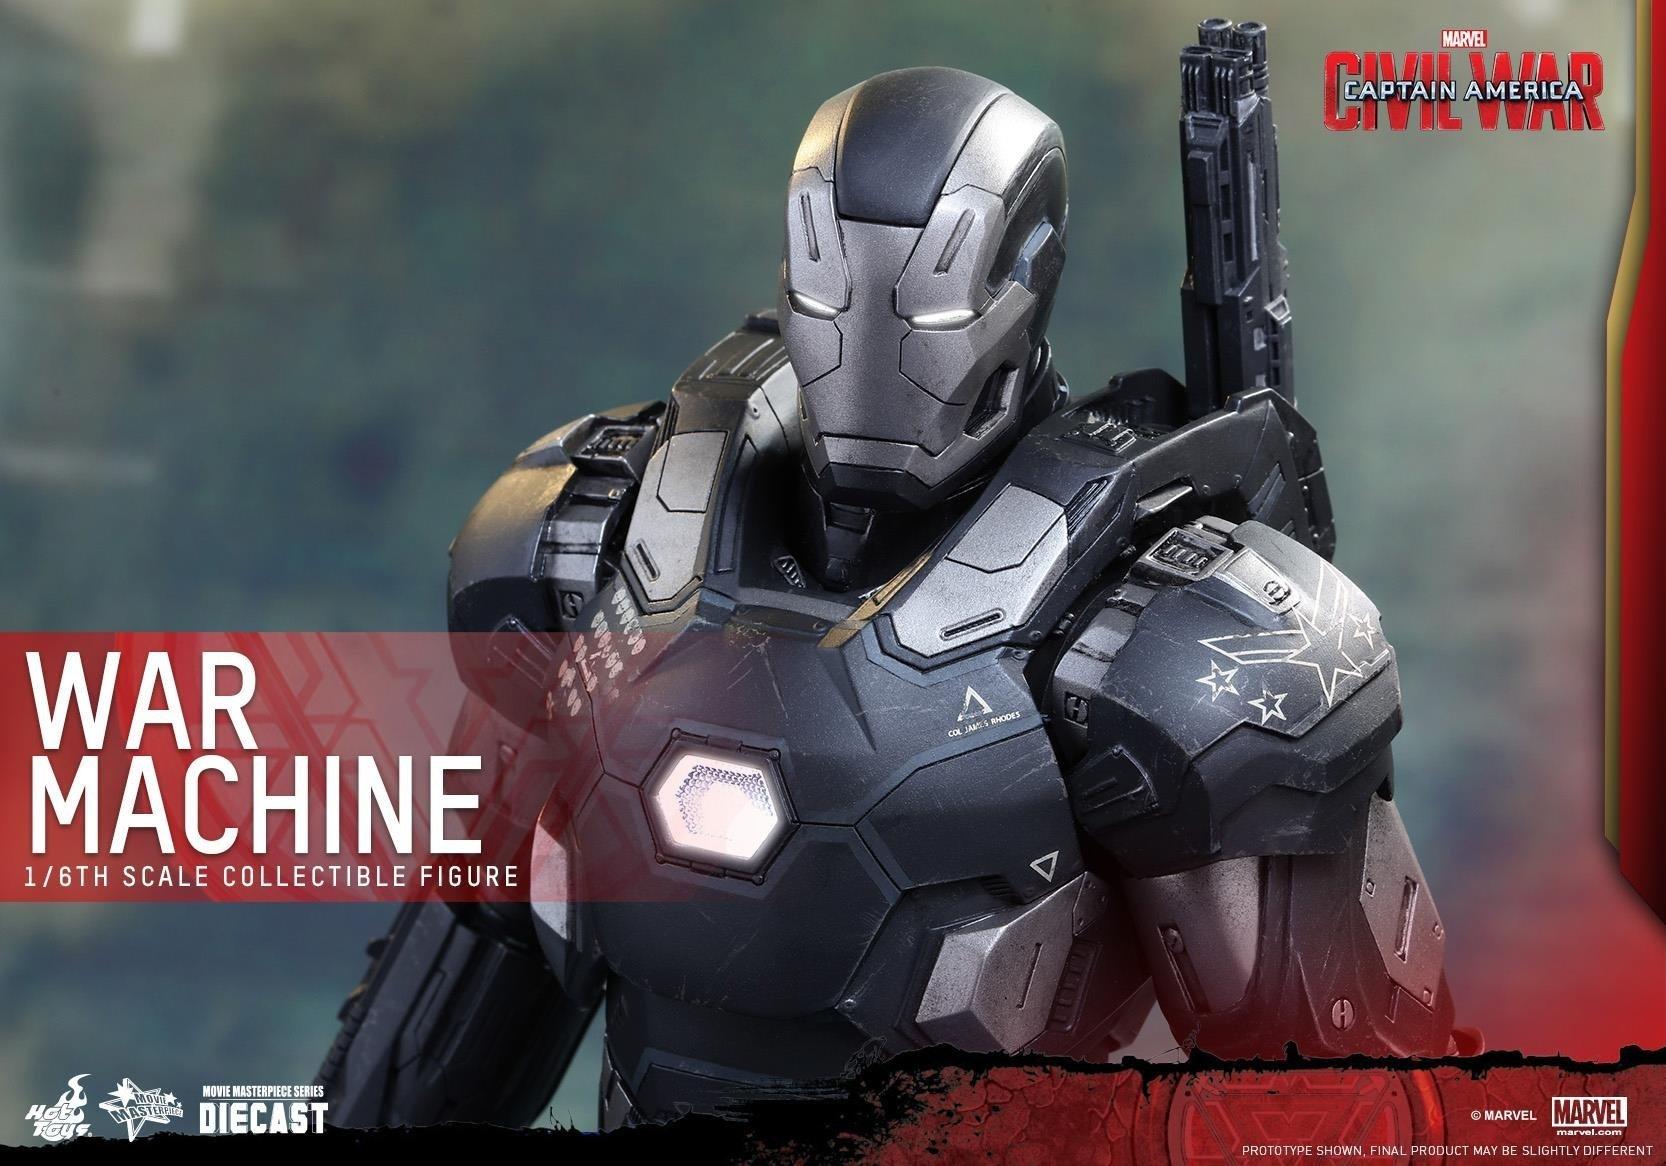 Filmy - Kapitan Ameryka: Wojna Bohaterów  Superhero Marvel Comics War Machine Figurine Tapeta